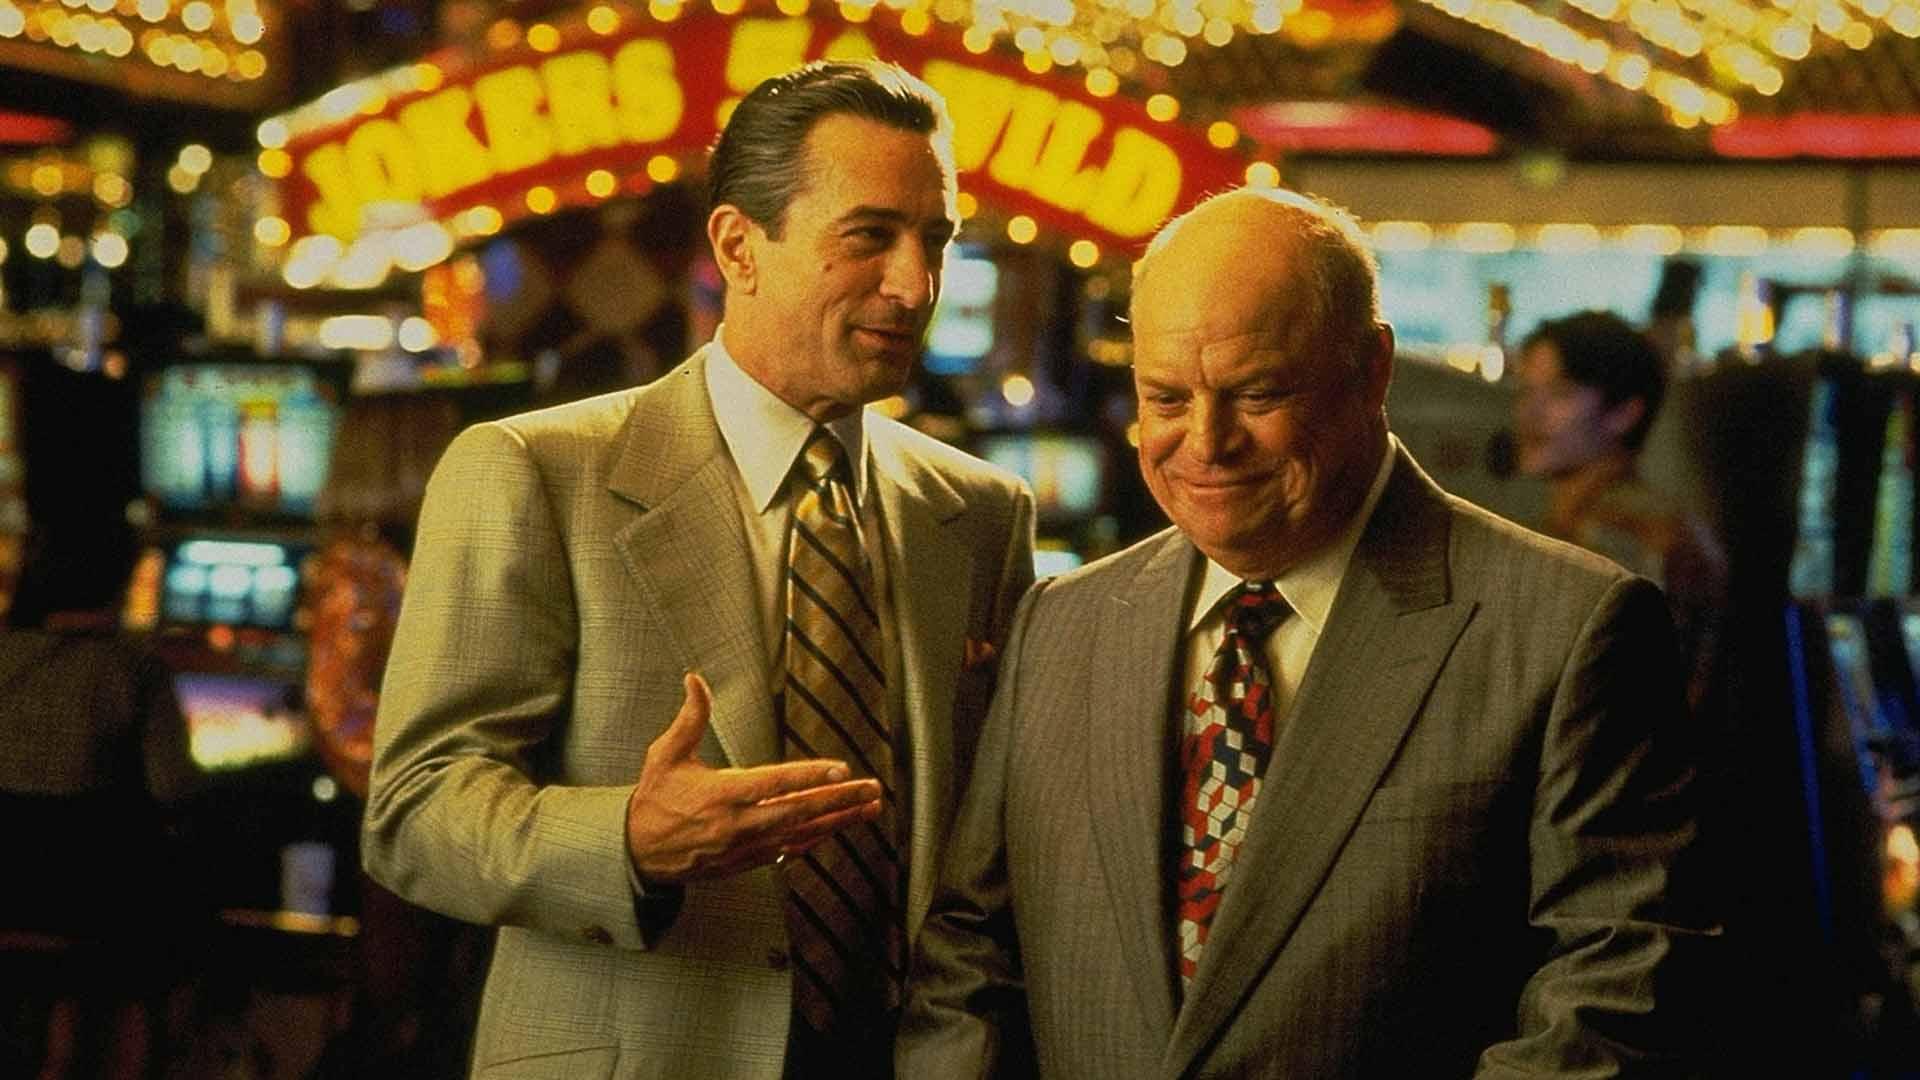 Смотреть онлайн казино 1995 в hd free online casino no downloads